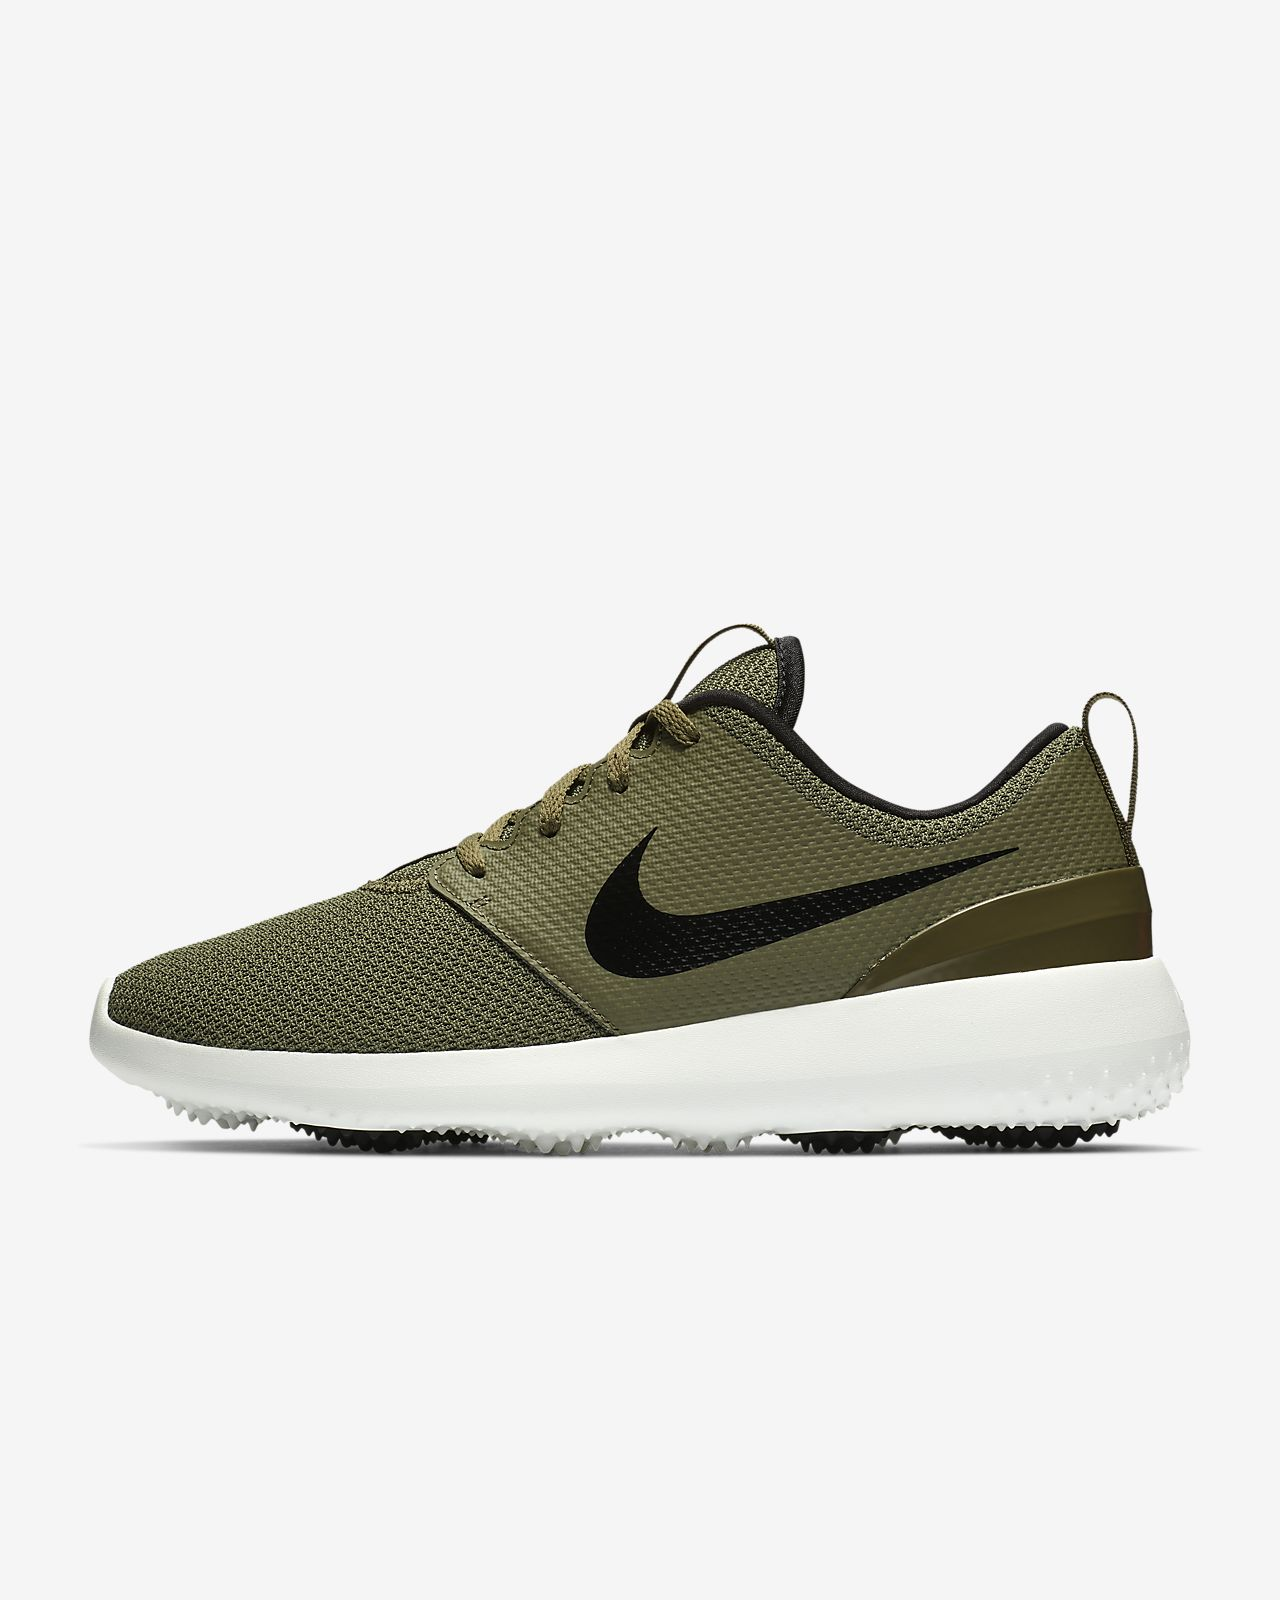 Pánská golfová bota Nike Roshe G. Nike.com CZ 44ad4435b1b